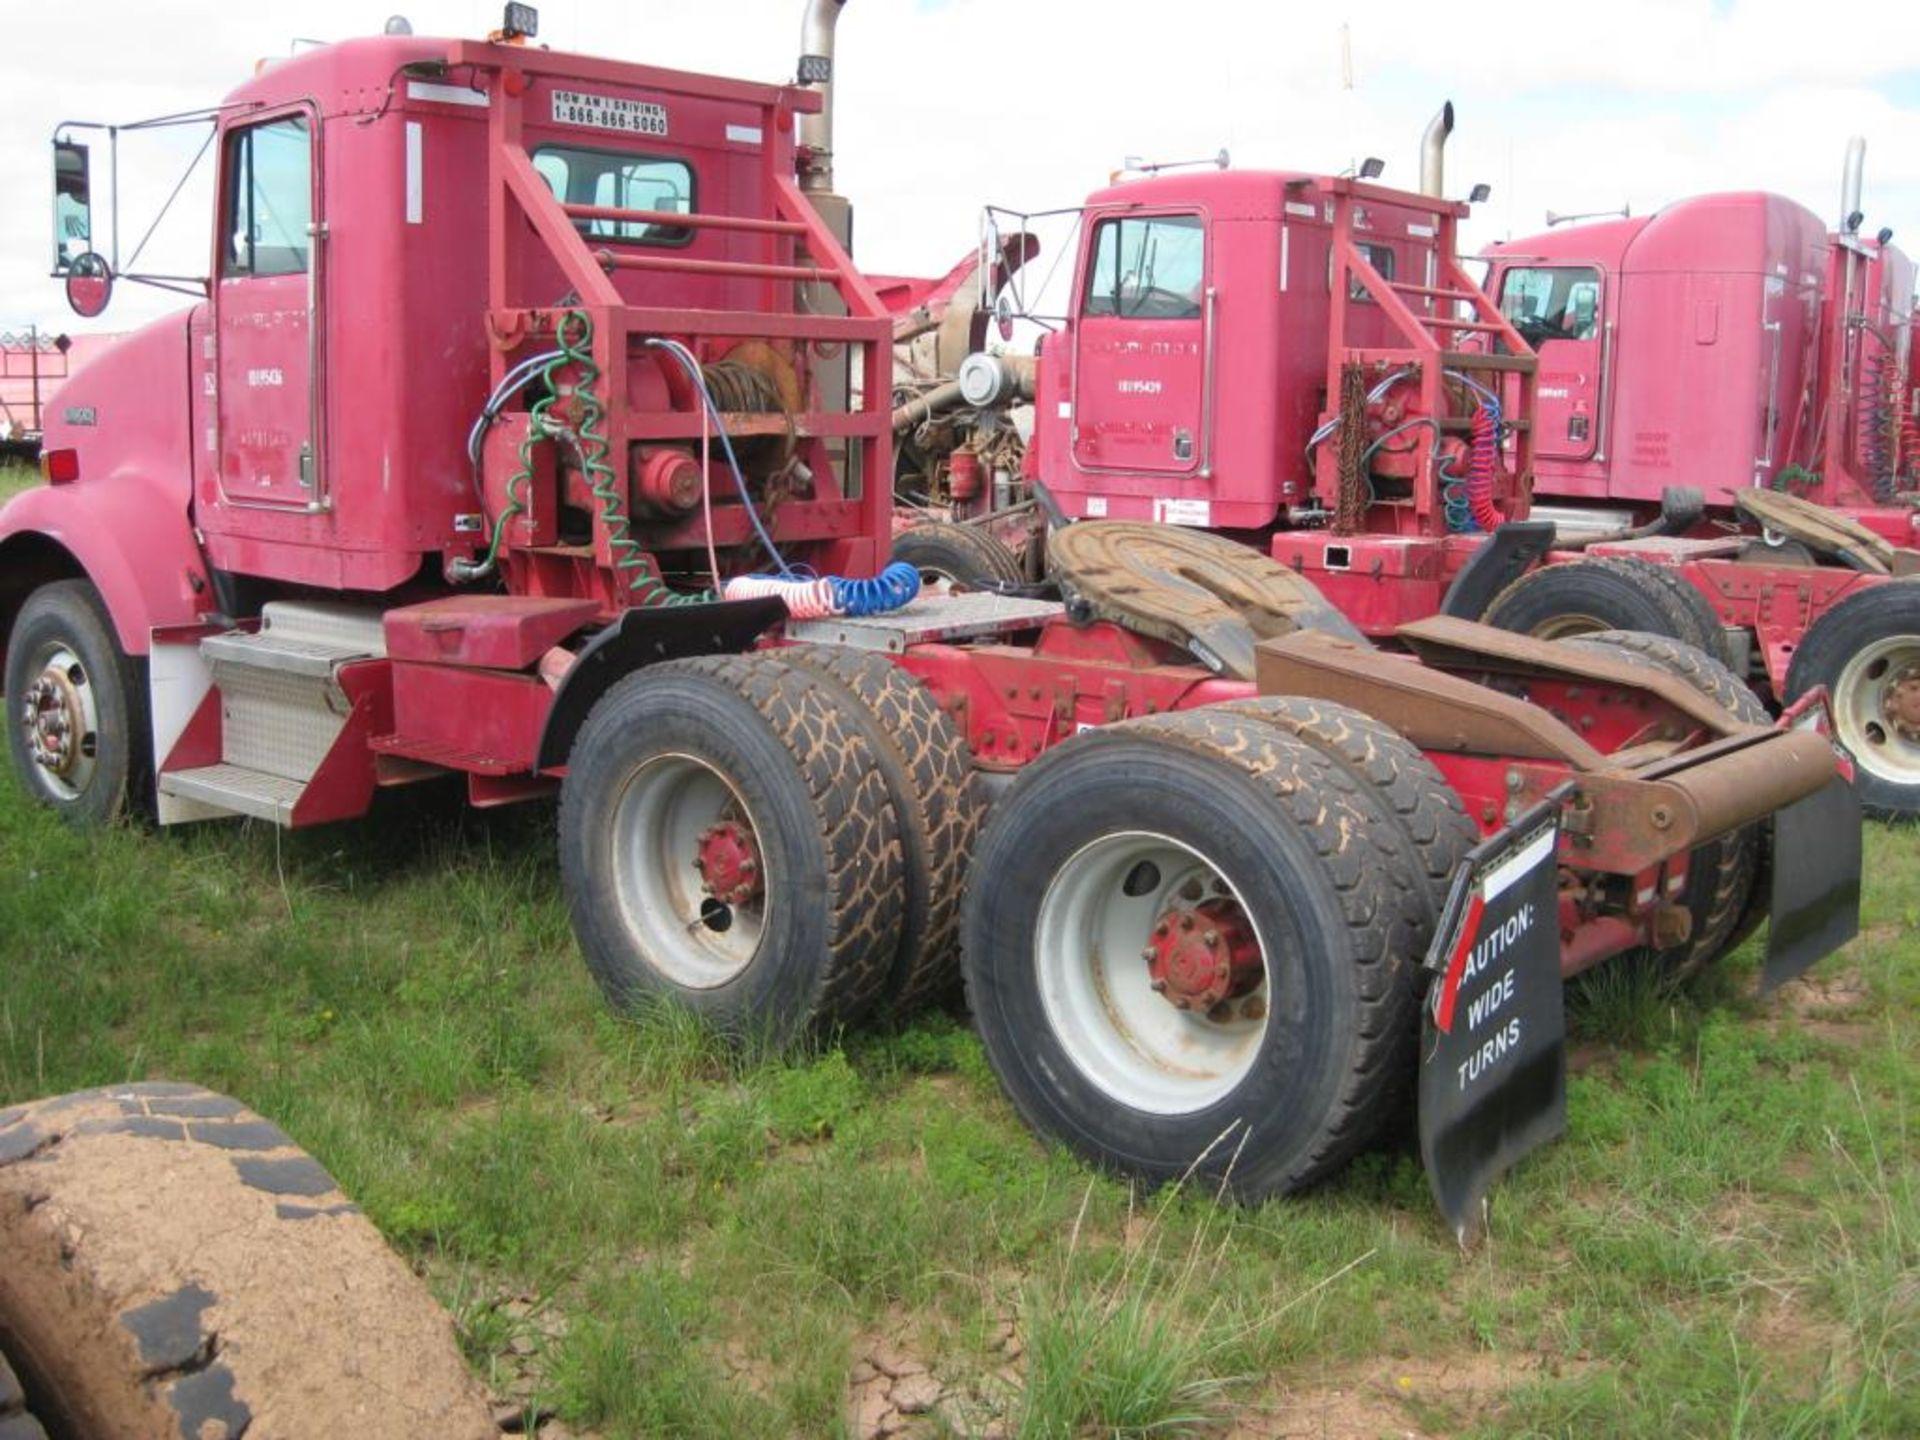 Kenworth Winch Truck - Image 5 of 23